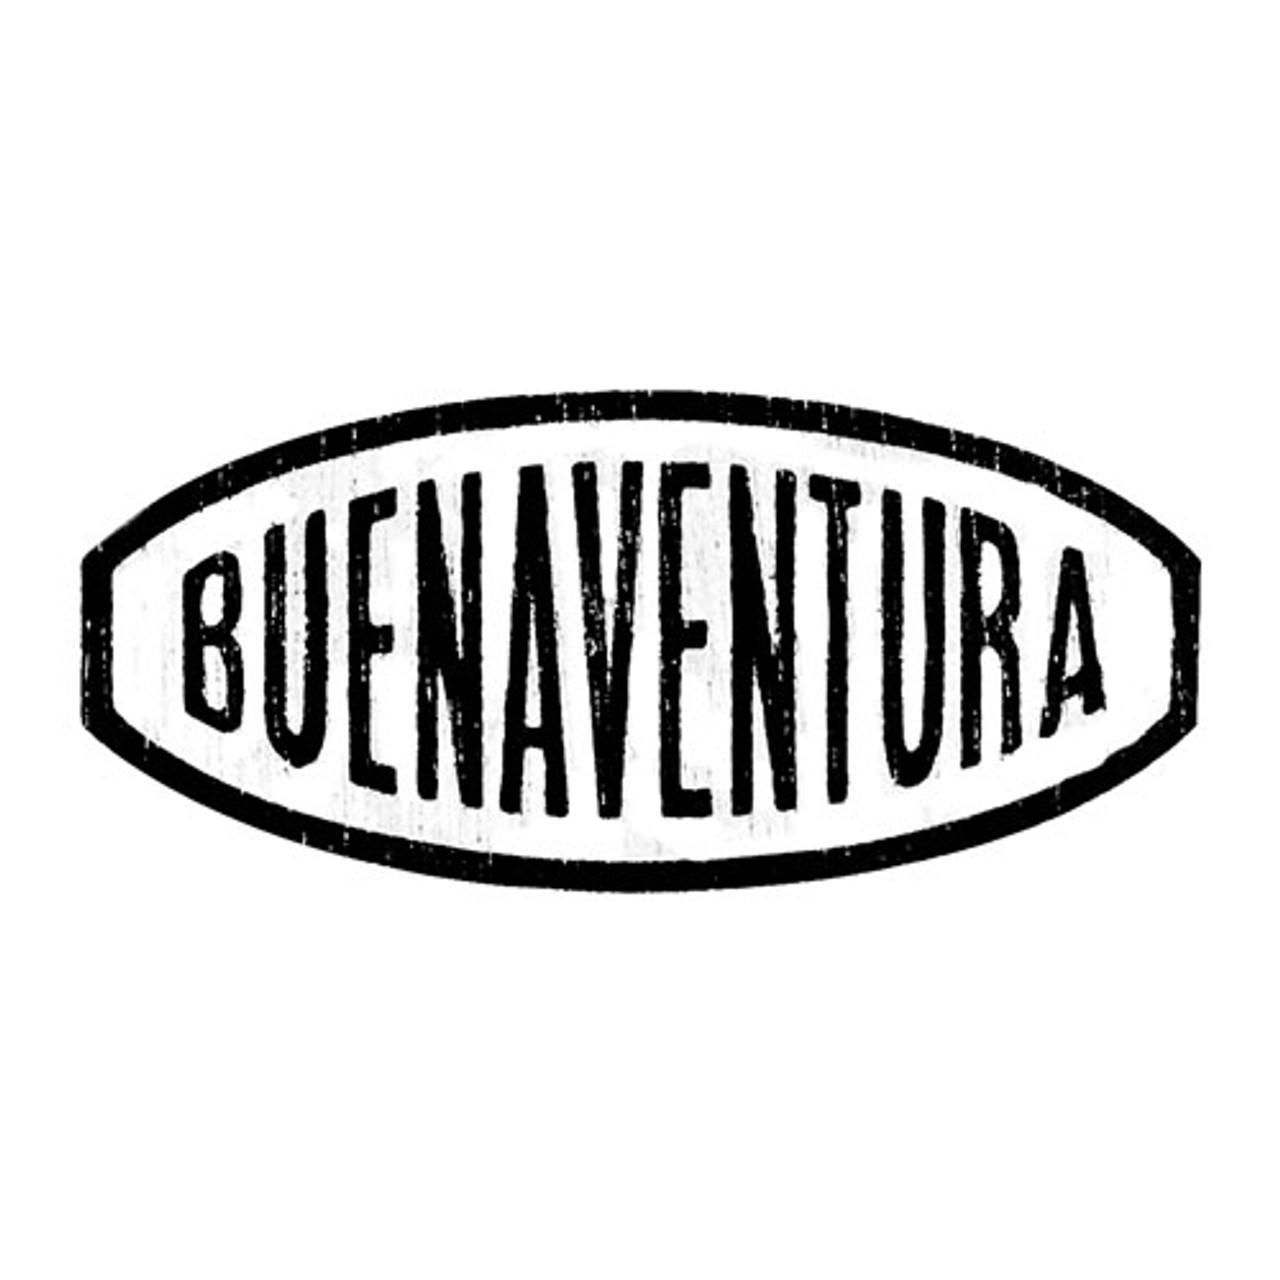 Curivari Buenaventura Mini BV Cigars - 3.5 x 50 (Box of 20)